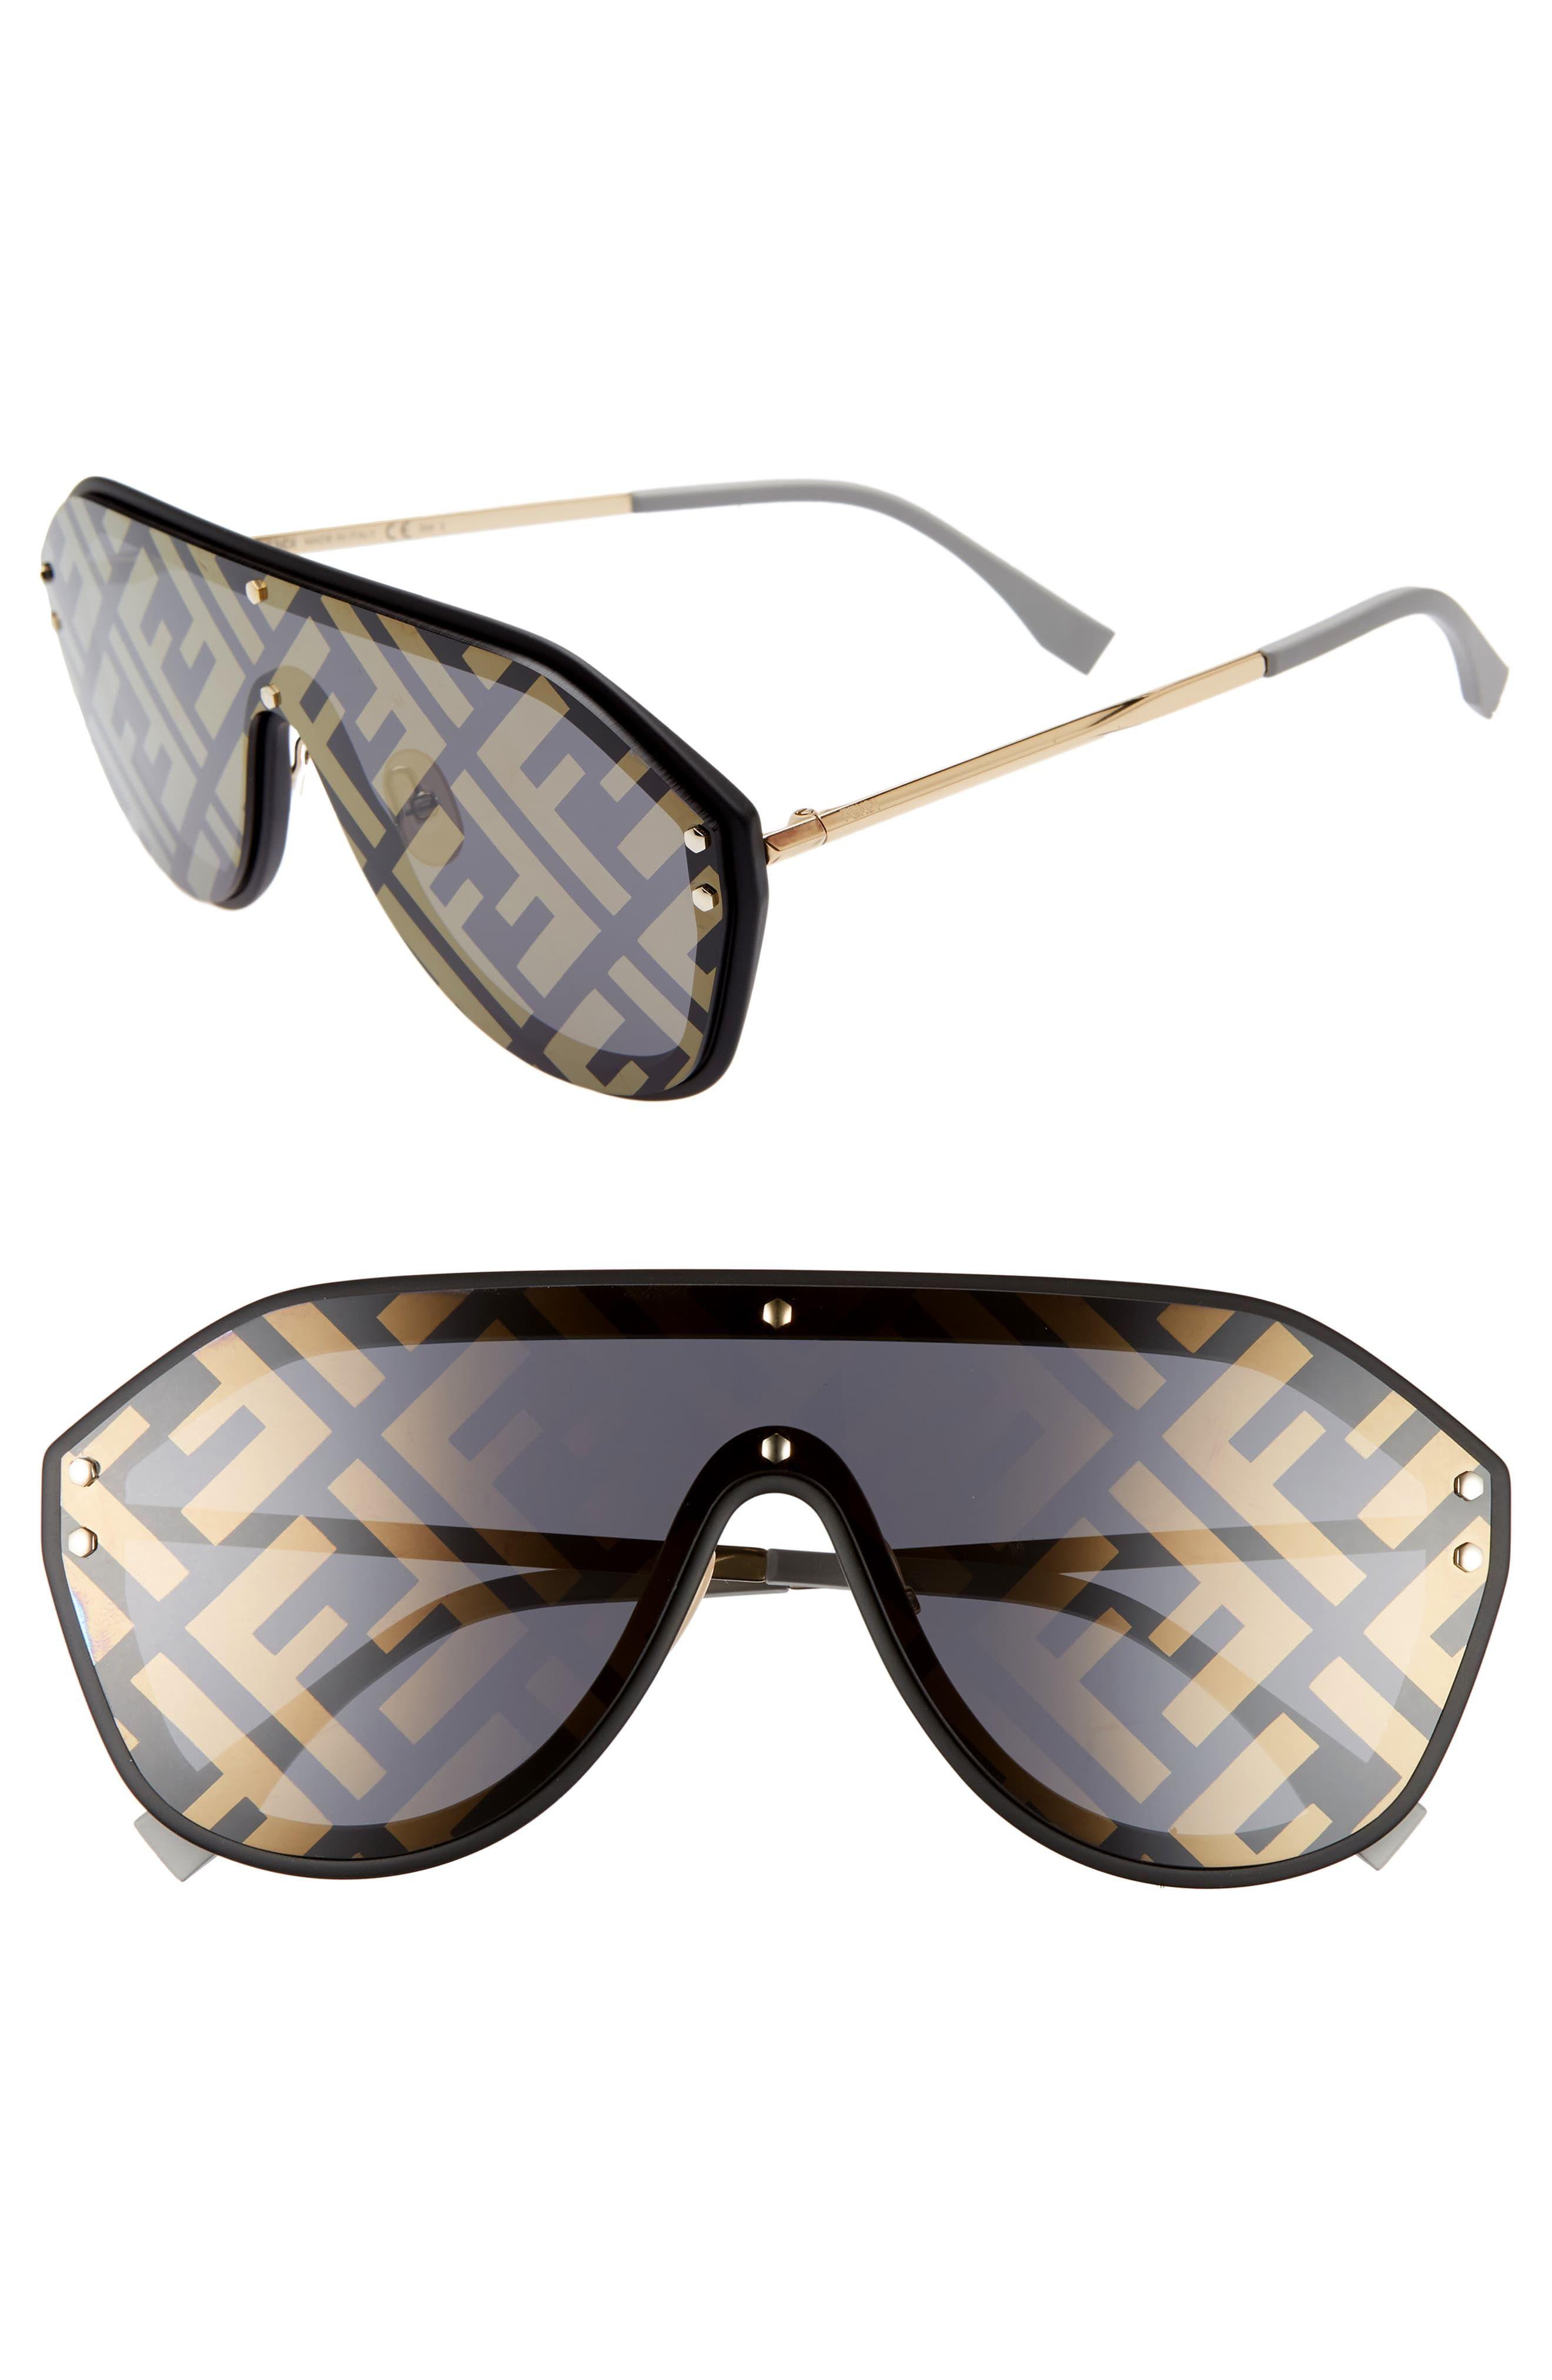 Sunglasses jewelry black sunglasses charm only best jewelry gift beach ocean